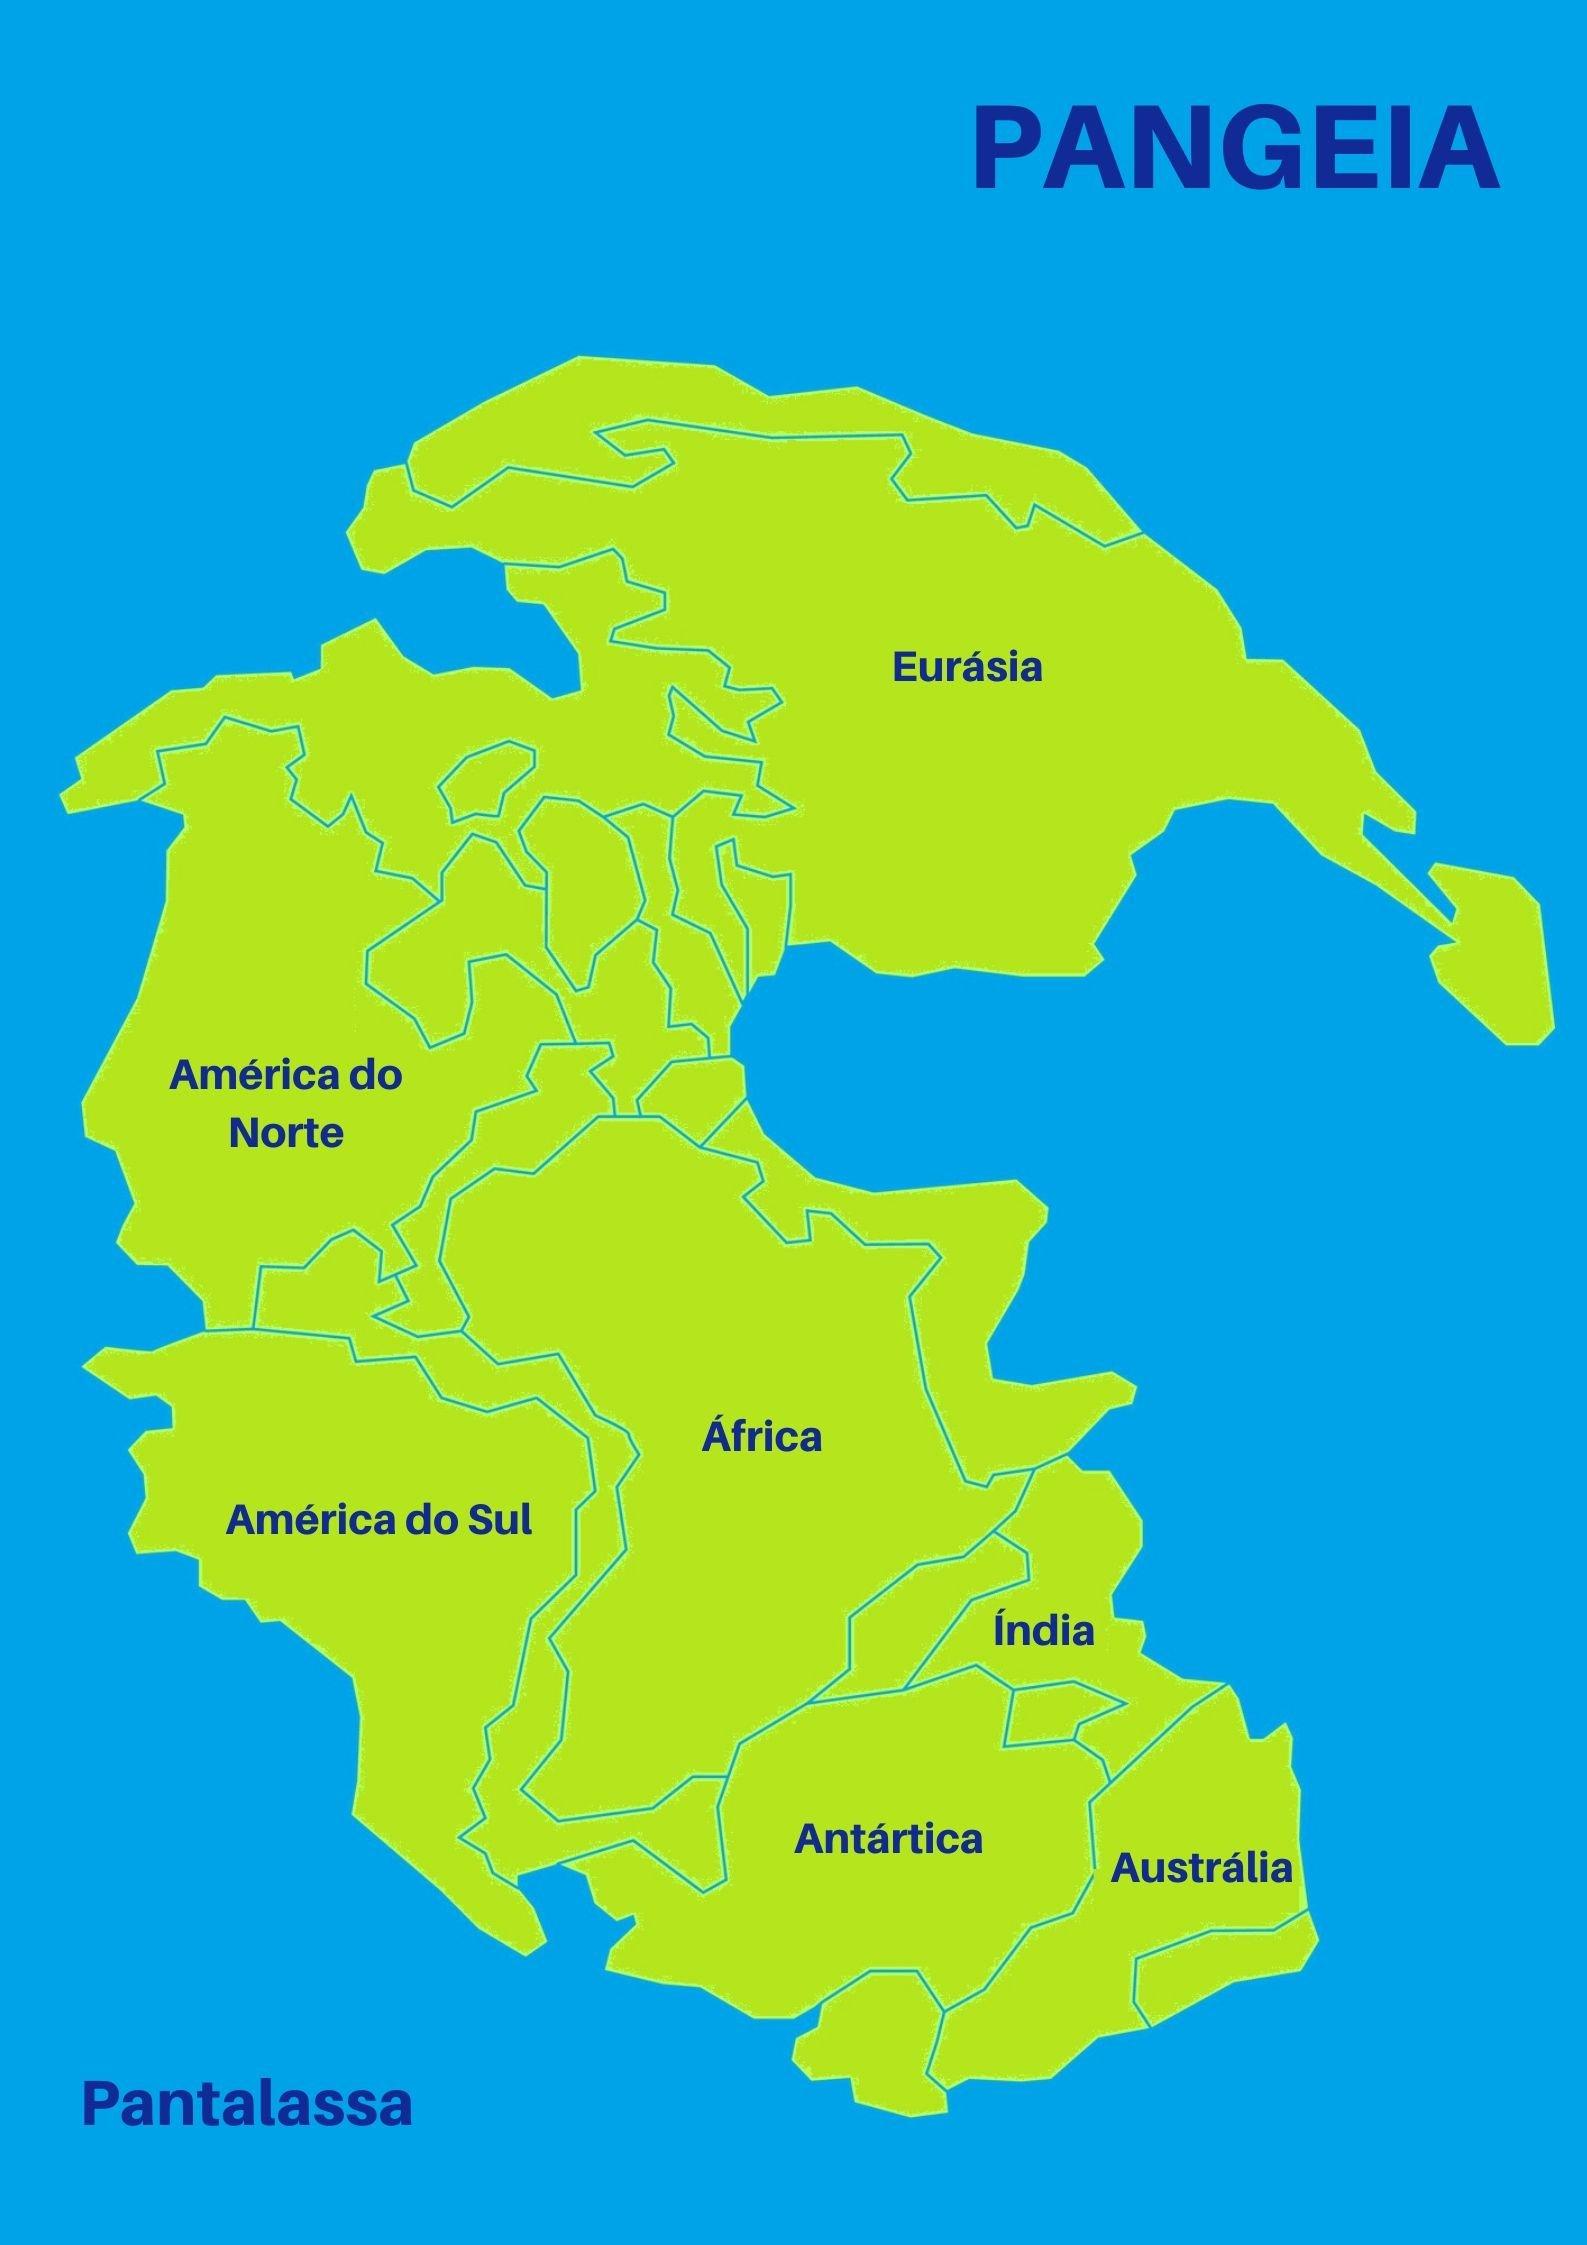 Pangeia mapa